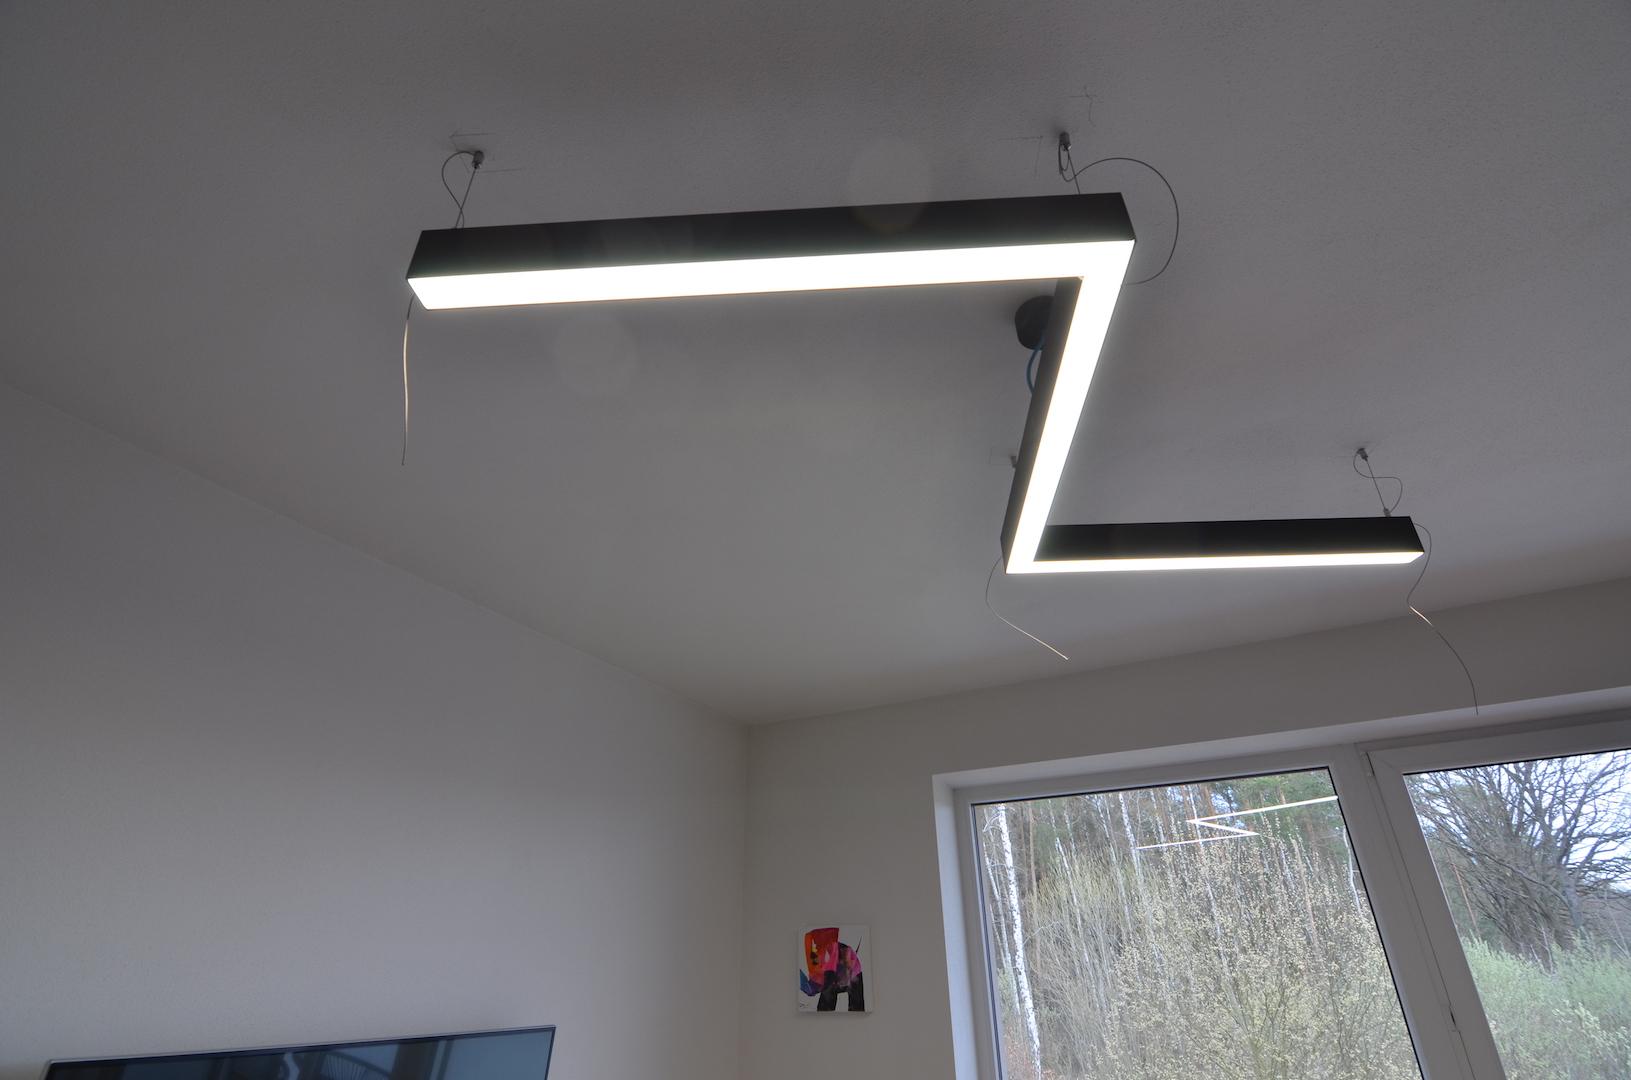 LED Linear Ledprofes